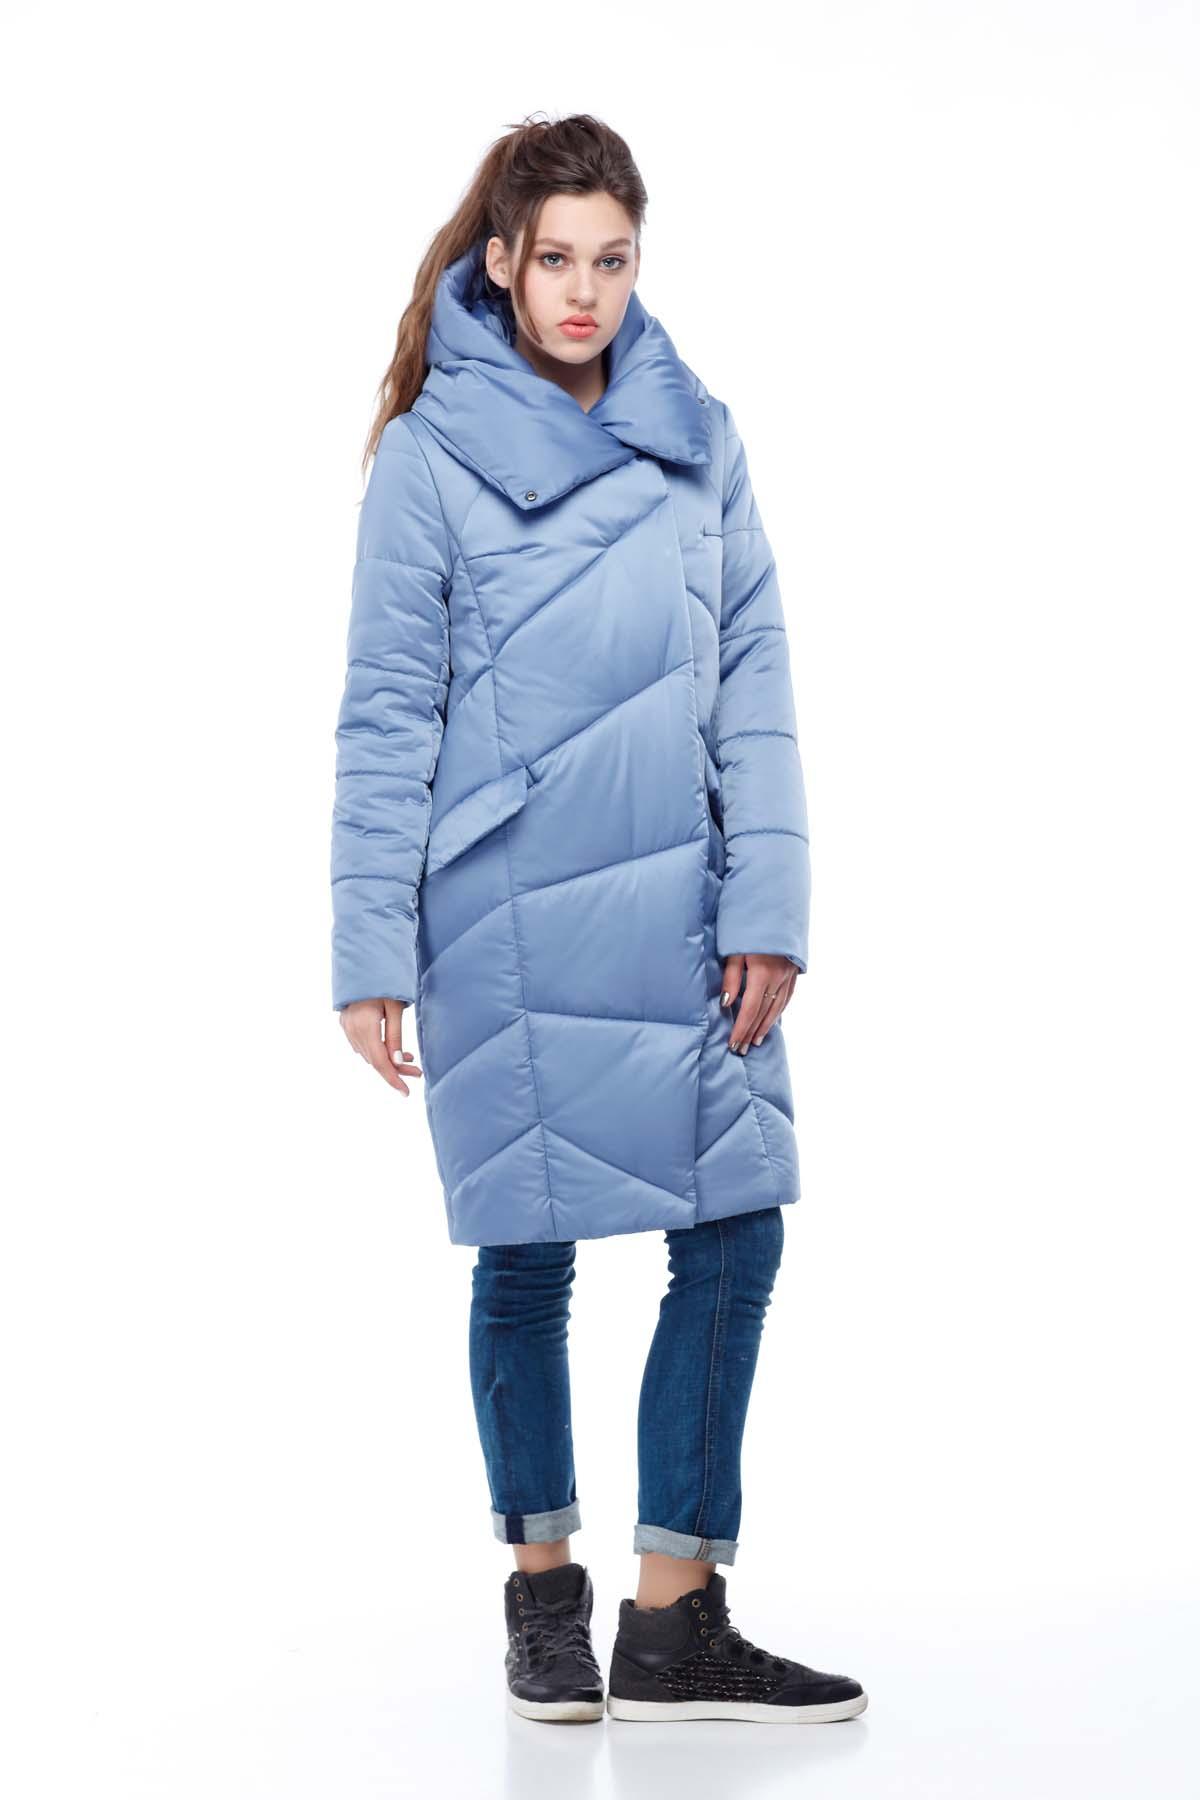 Пальто стьобана Карина блакитний лід (атлас)